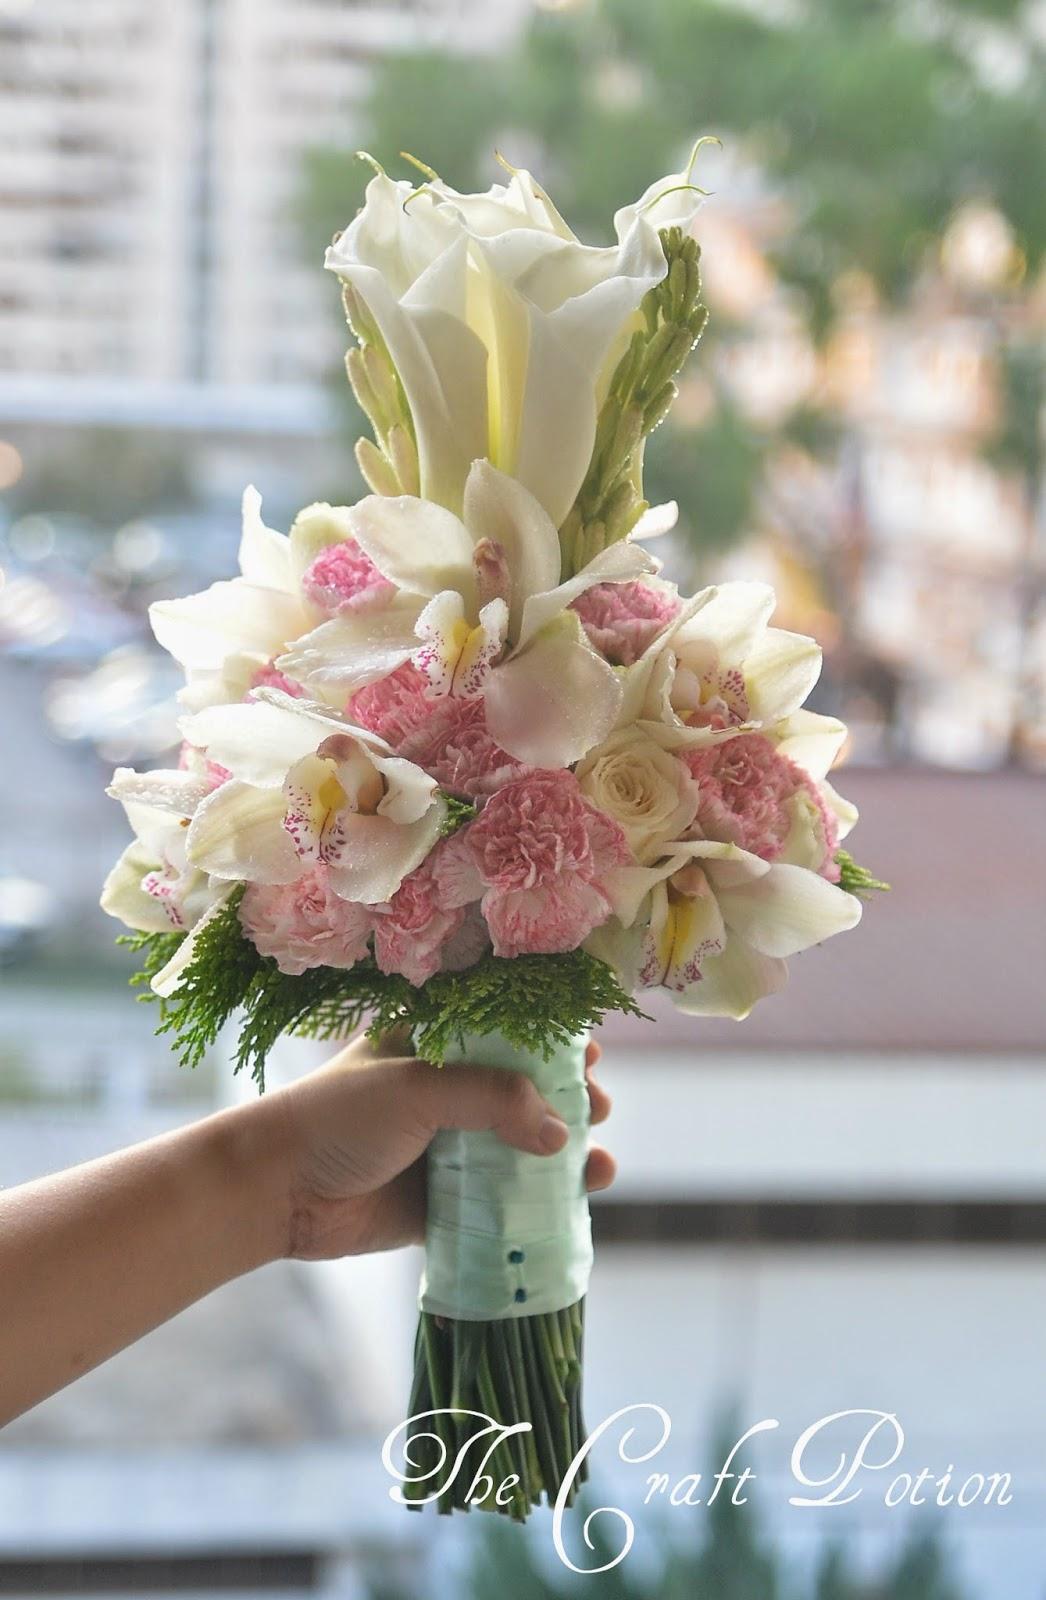 The craft potion handbouquet fresh flowers recent order for handbouquet fresh flowers izmirmasajfo